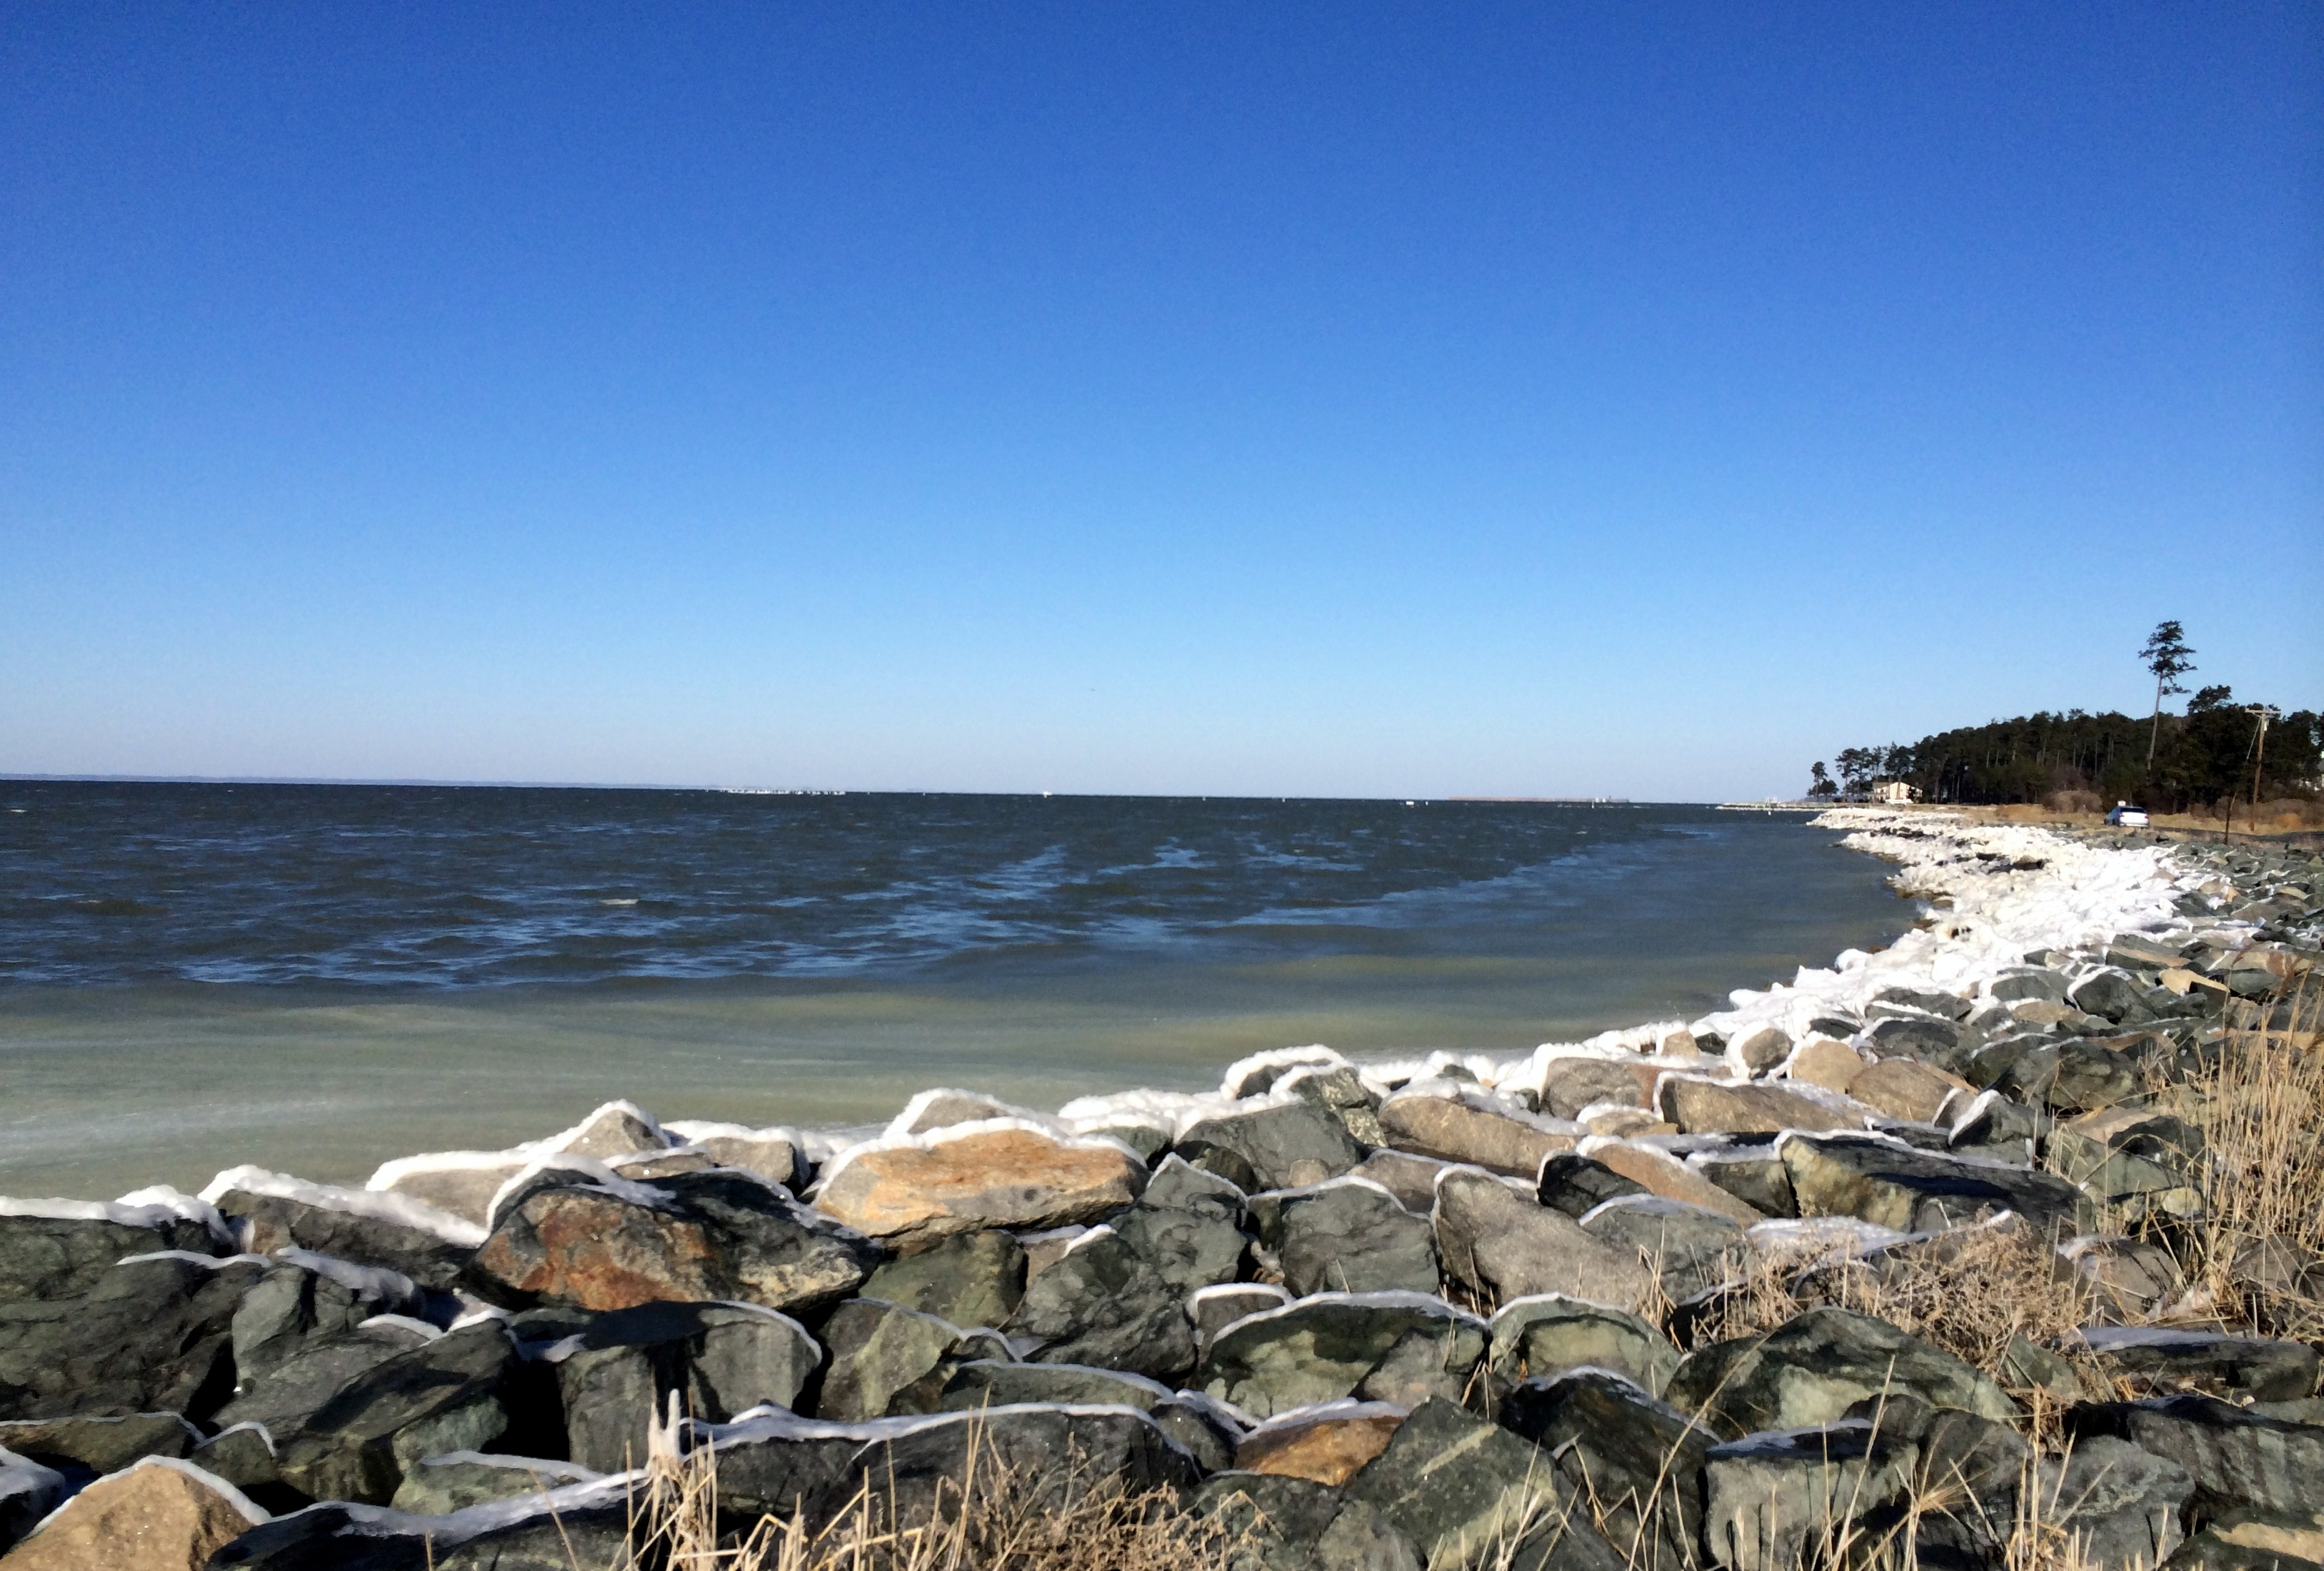 Tilghman Island off season